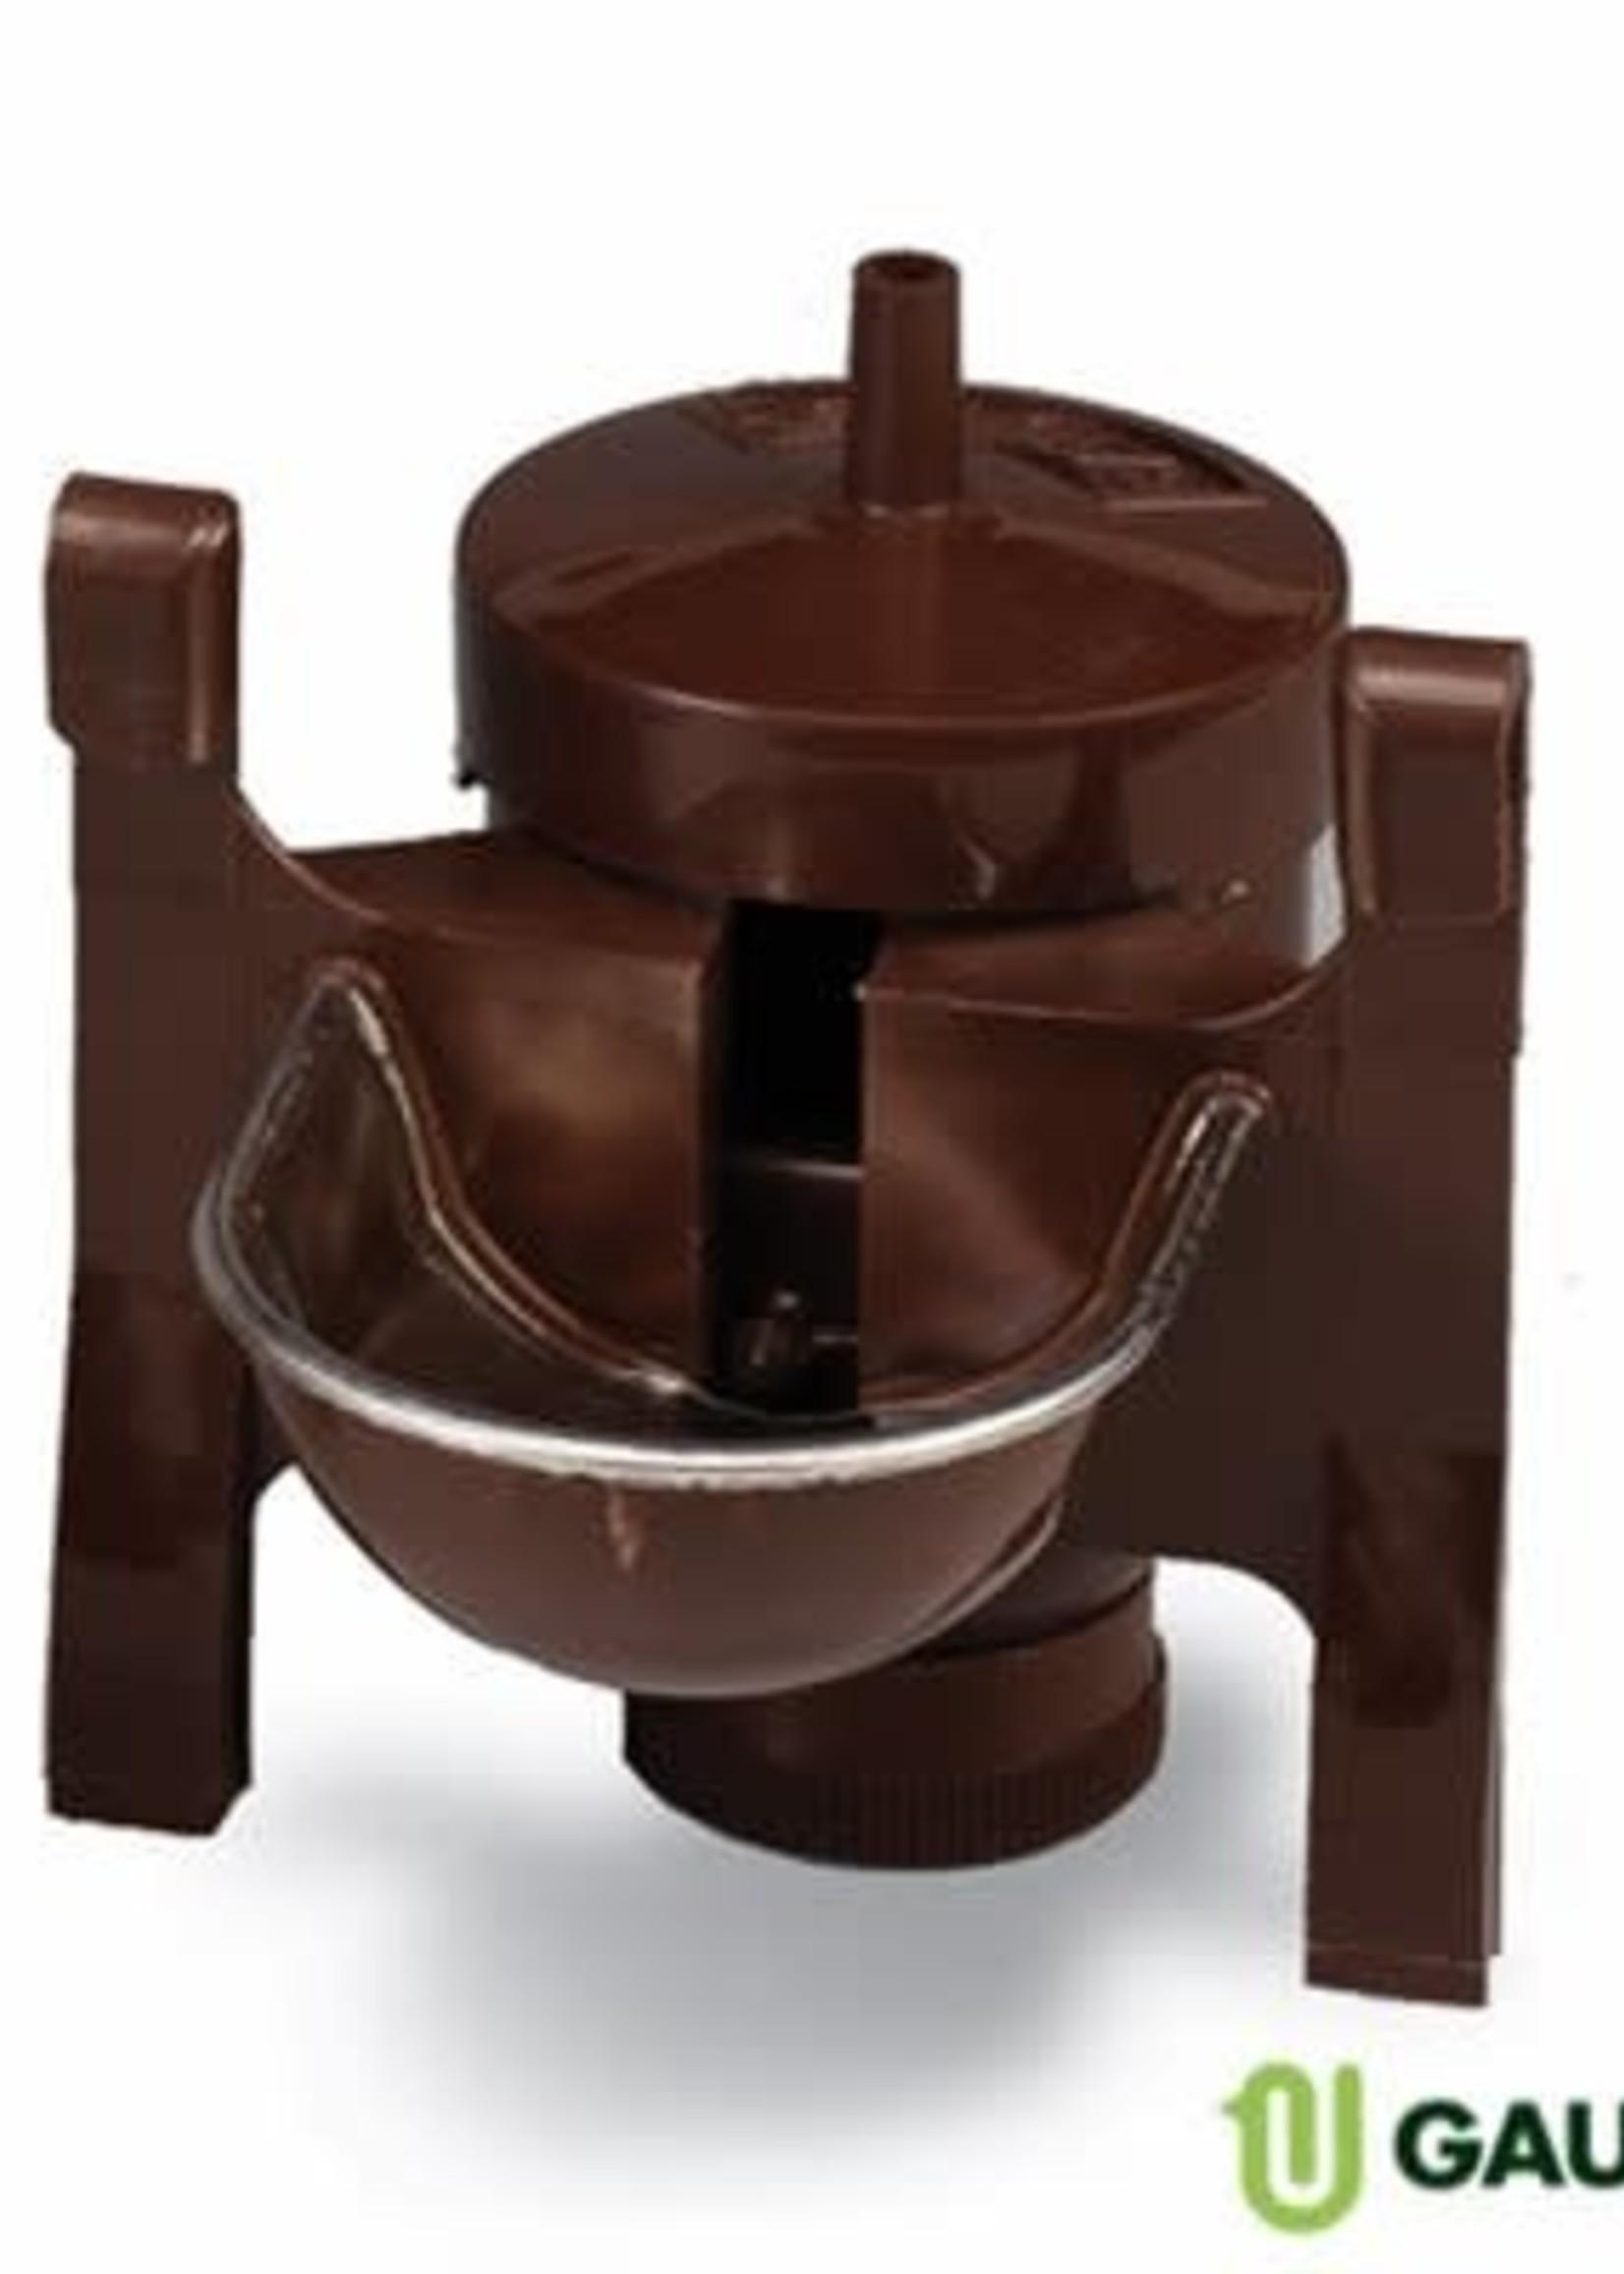 Gaun Abreuvoir automatique seul, coupelle, inox & plast. brun